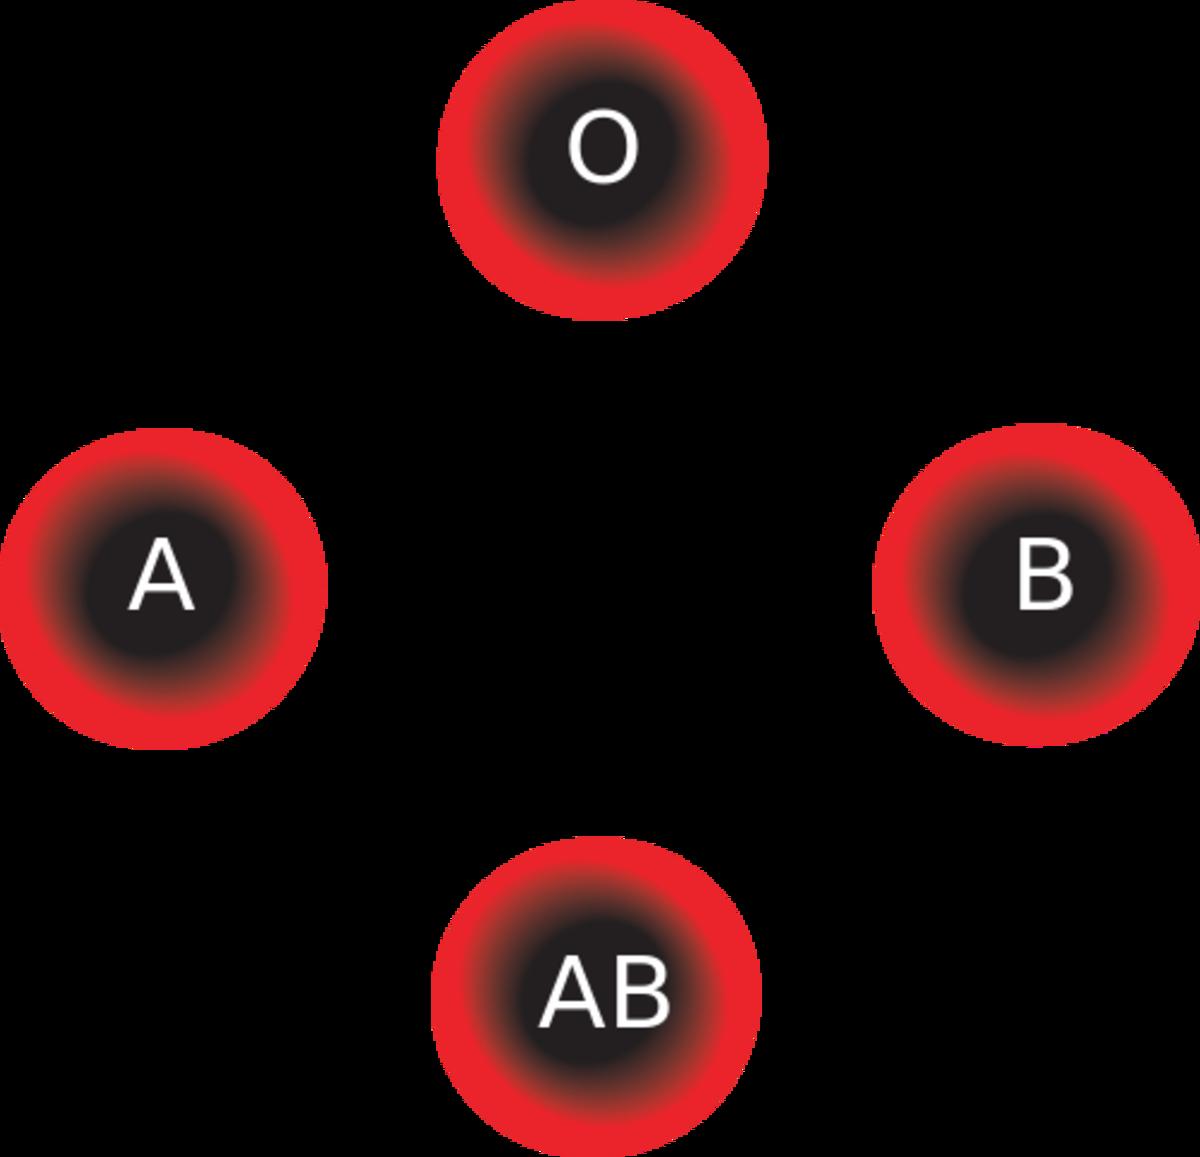 Diagram of blood types